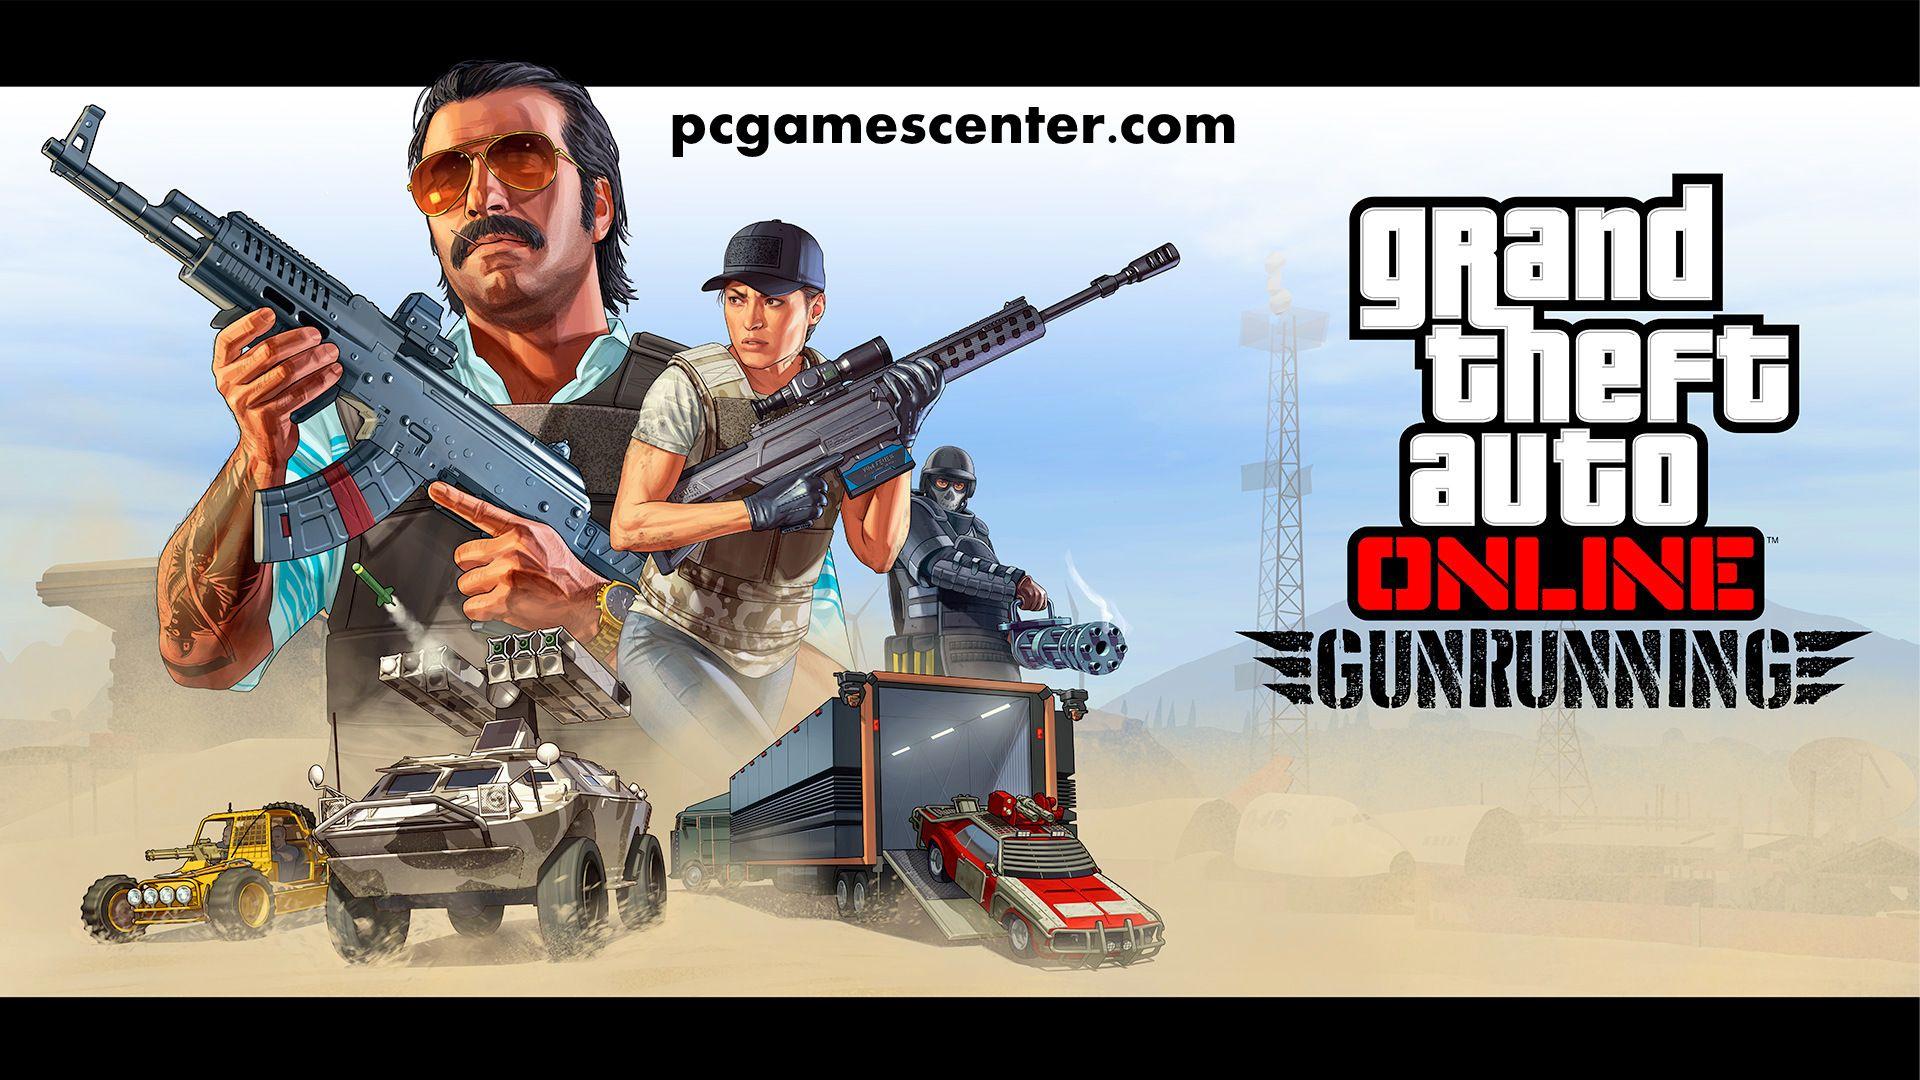 Gta online, free download Mac